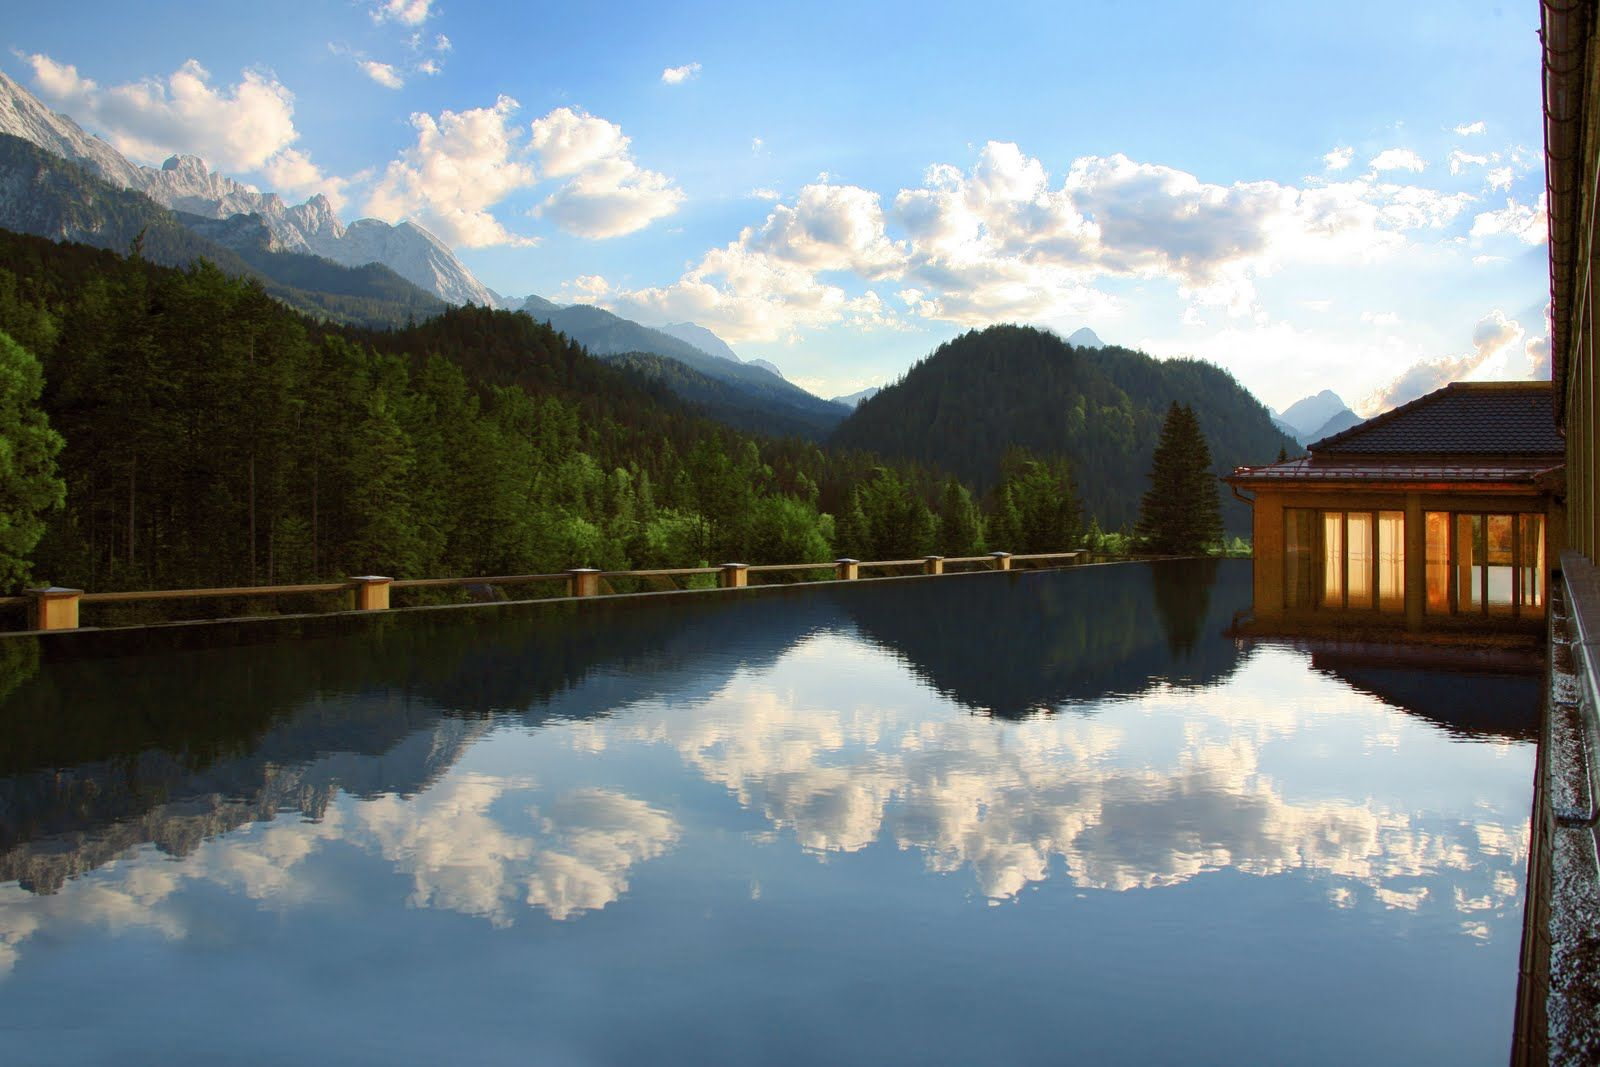 Infinity Pool Deutschland hotel schloss elmau hotel elmau hotel bayern hotel deutschland